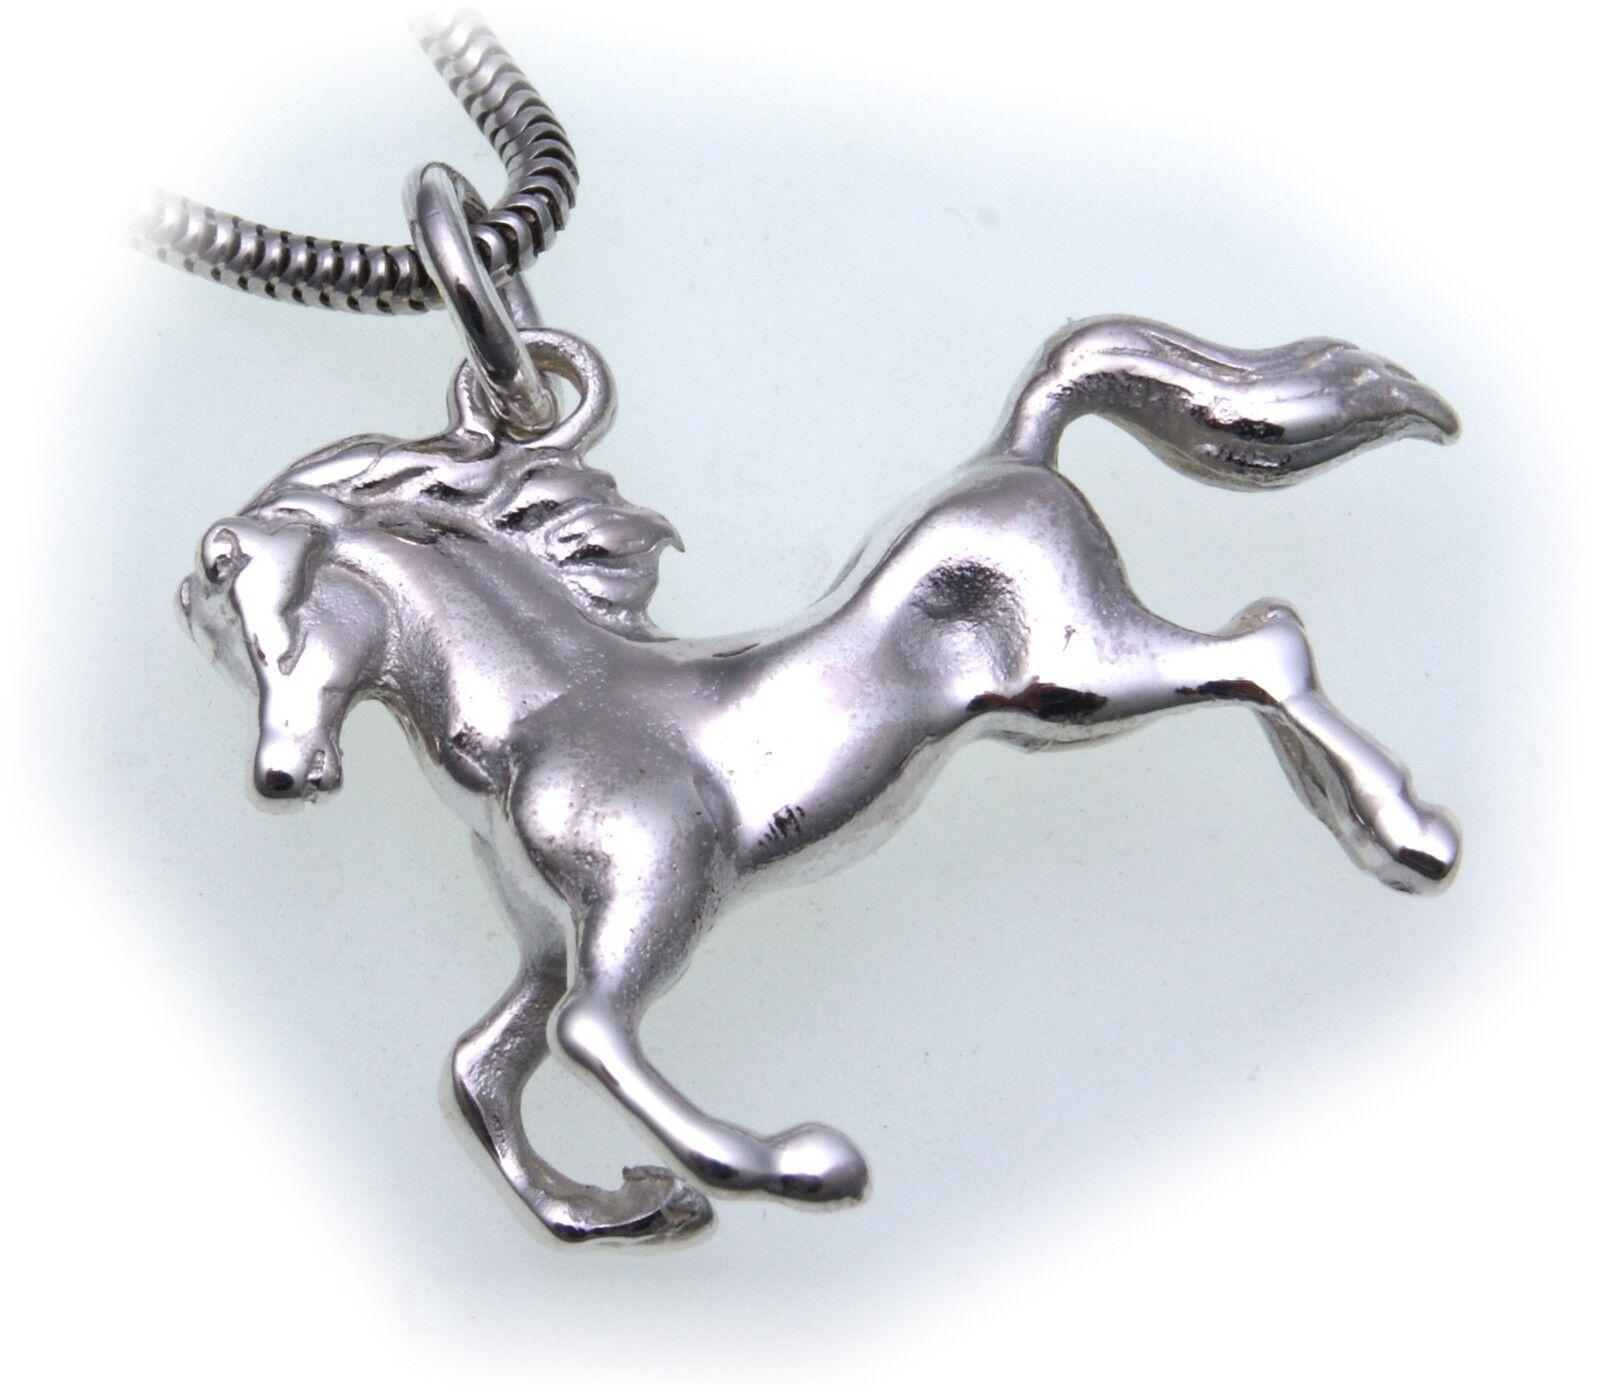 Pferd echt silver 925 Anhänger plastisch 3D schwere Qualität  Sterlingsilver Uni